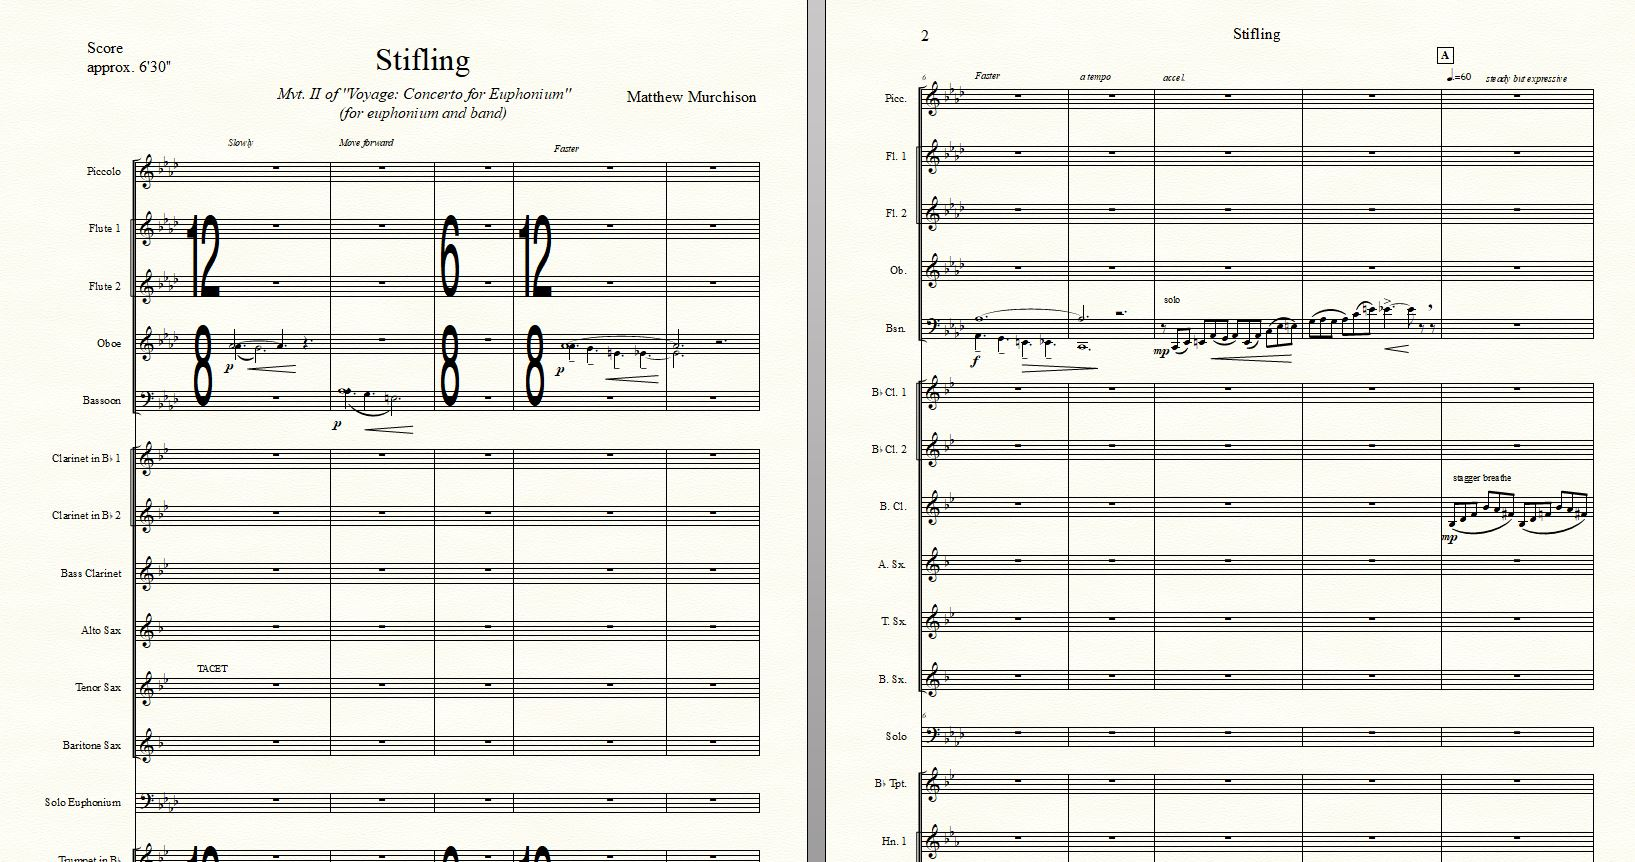 Stifling_band1.JPG